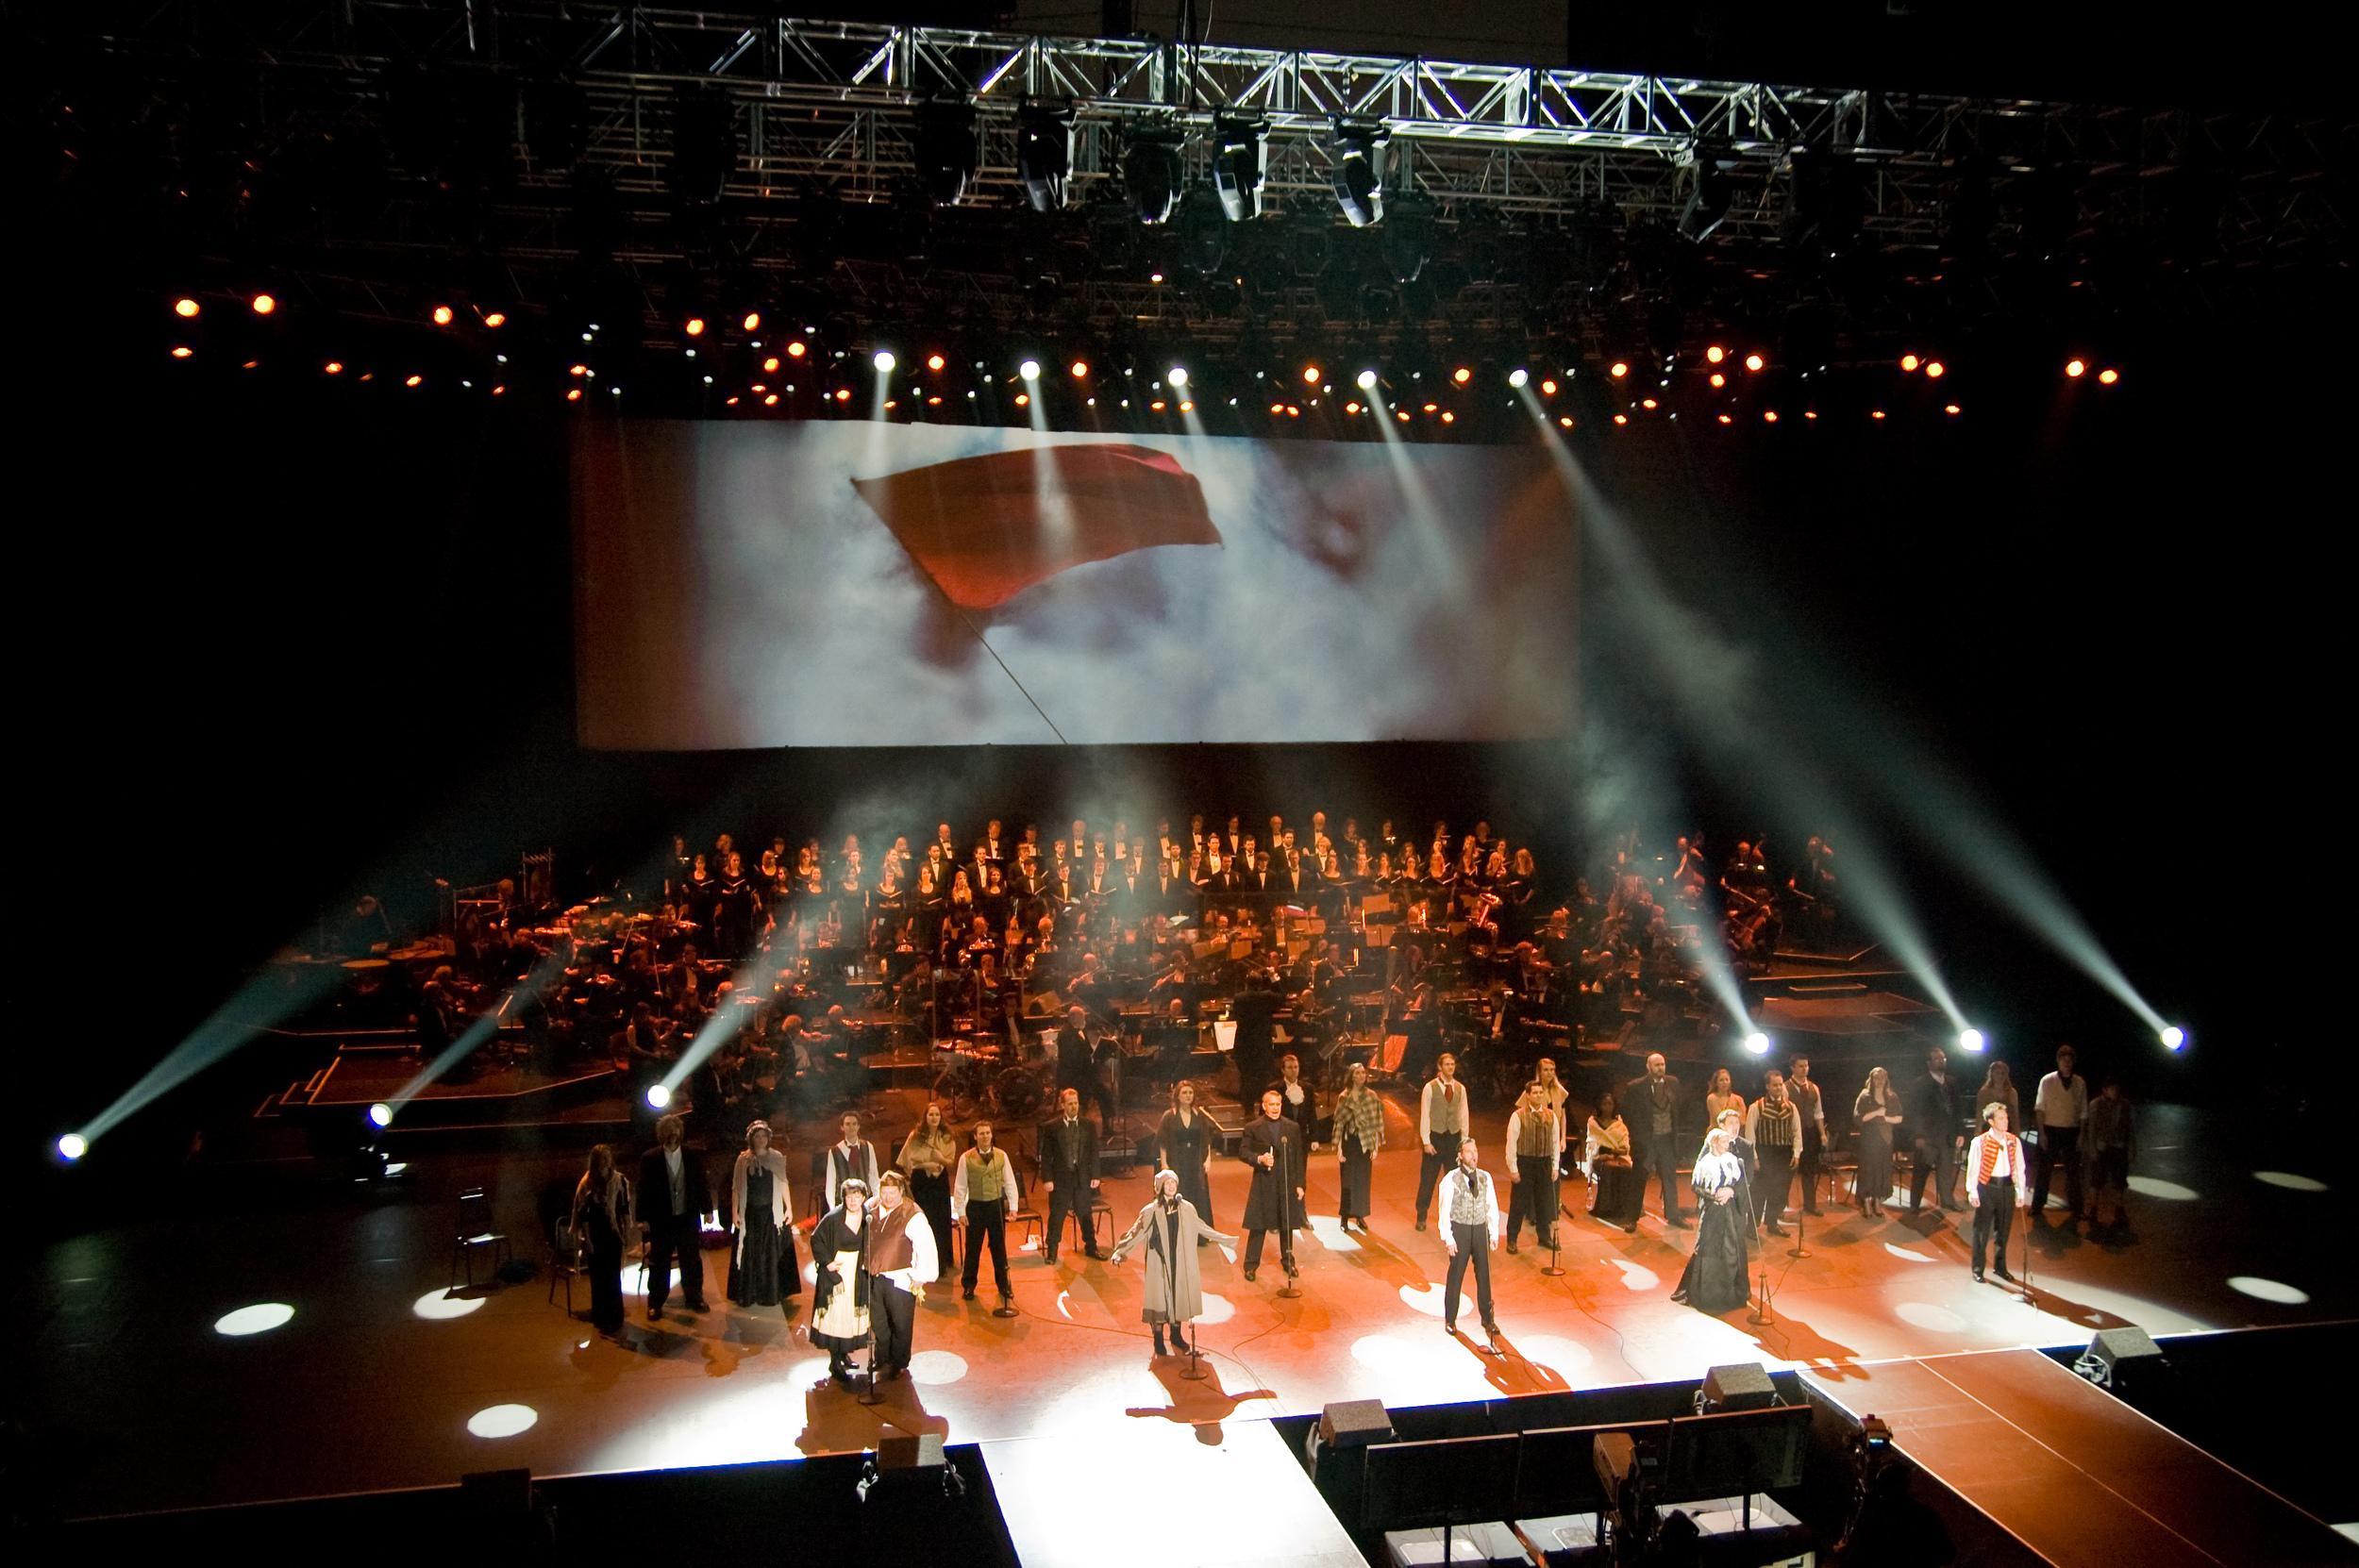 Les Miserables in Concert